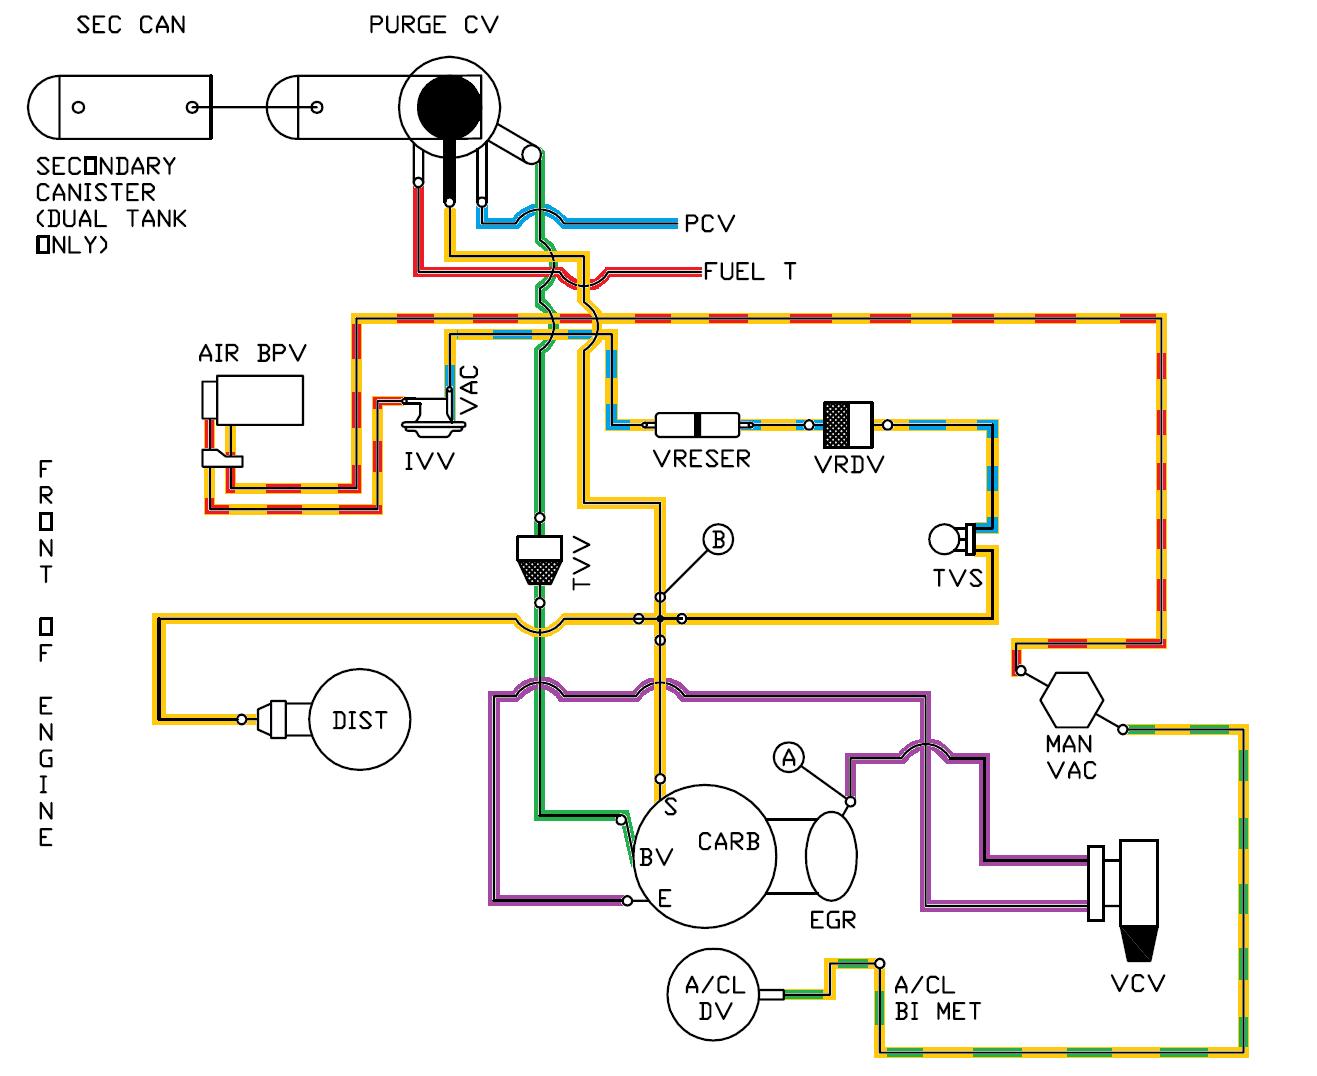 1979 Ford Truck Vacuum Diagram Trusted Wiring Diagrams F 150 4x4 F150 Explore Schematic U2022 2001 Ranger